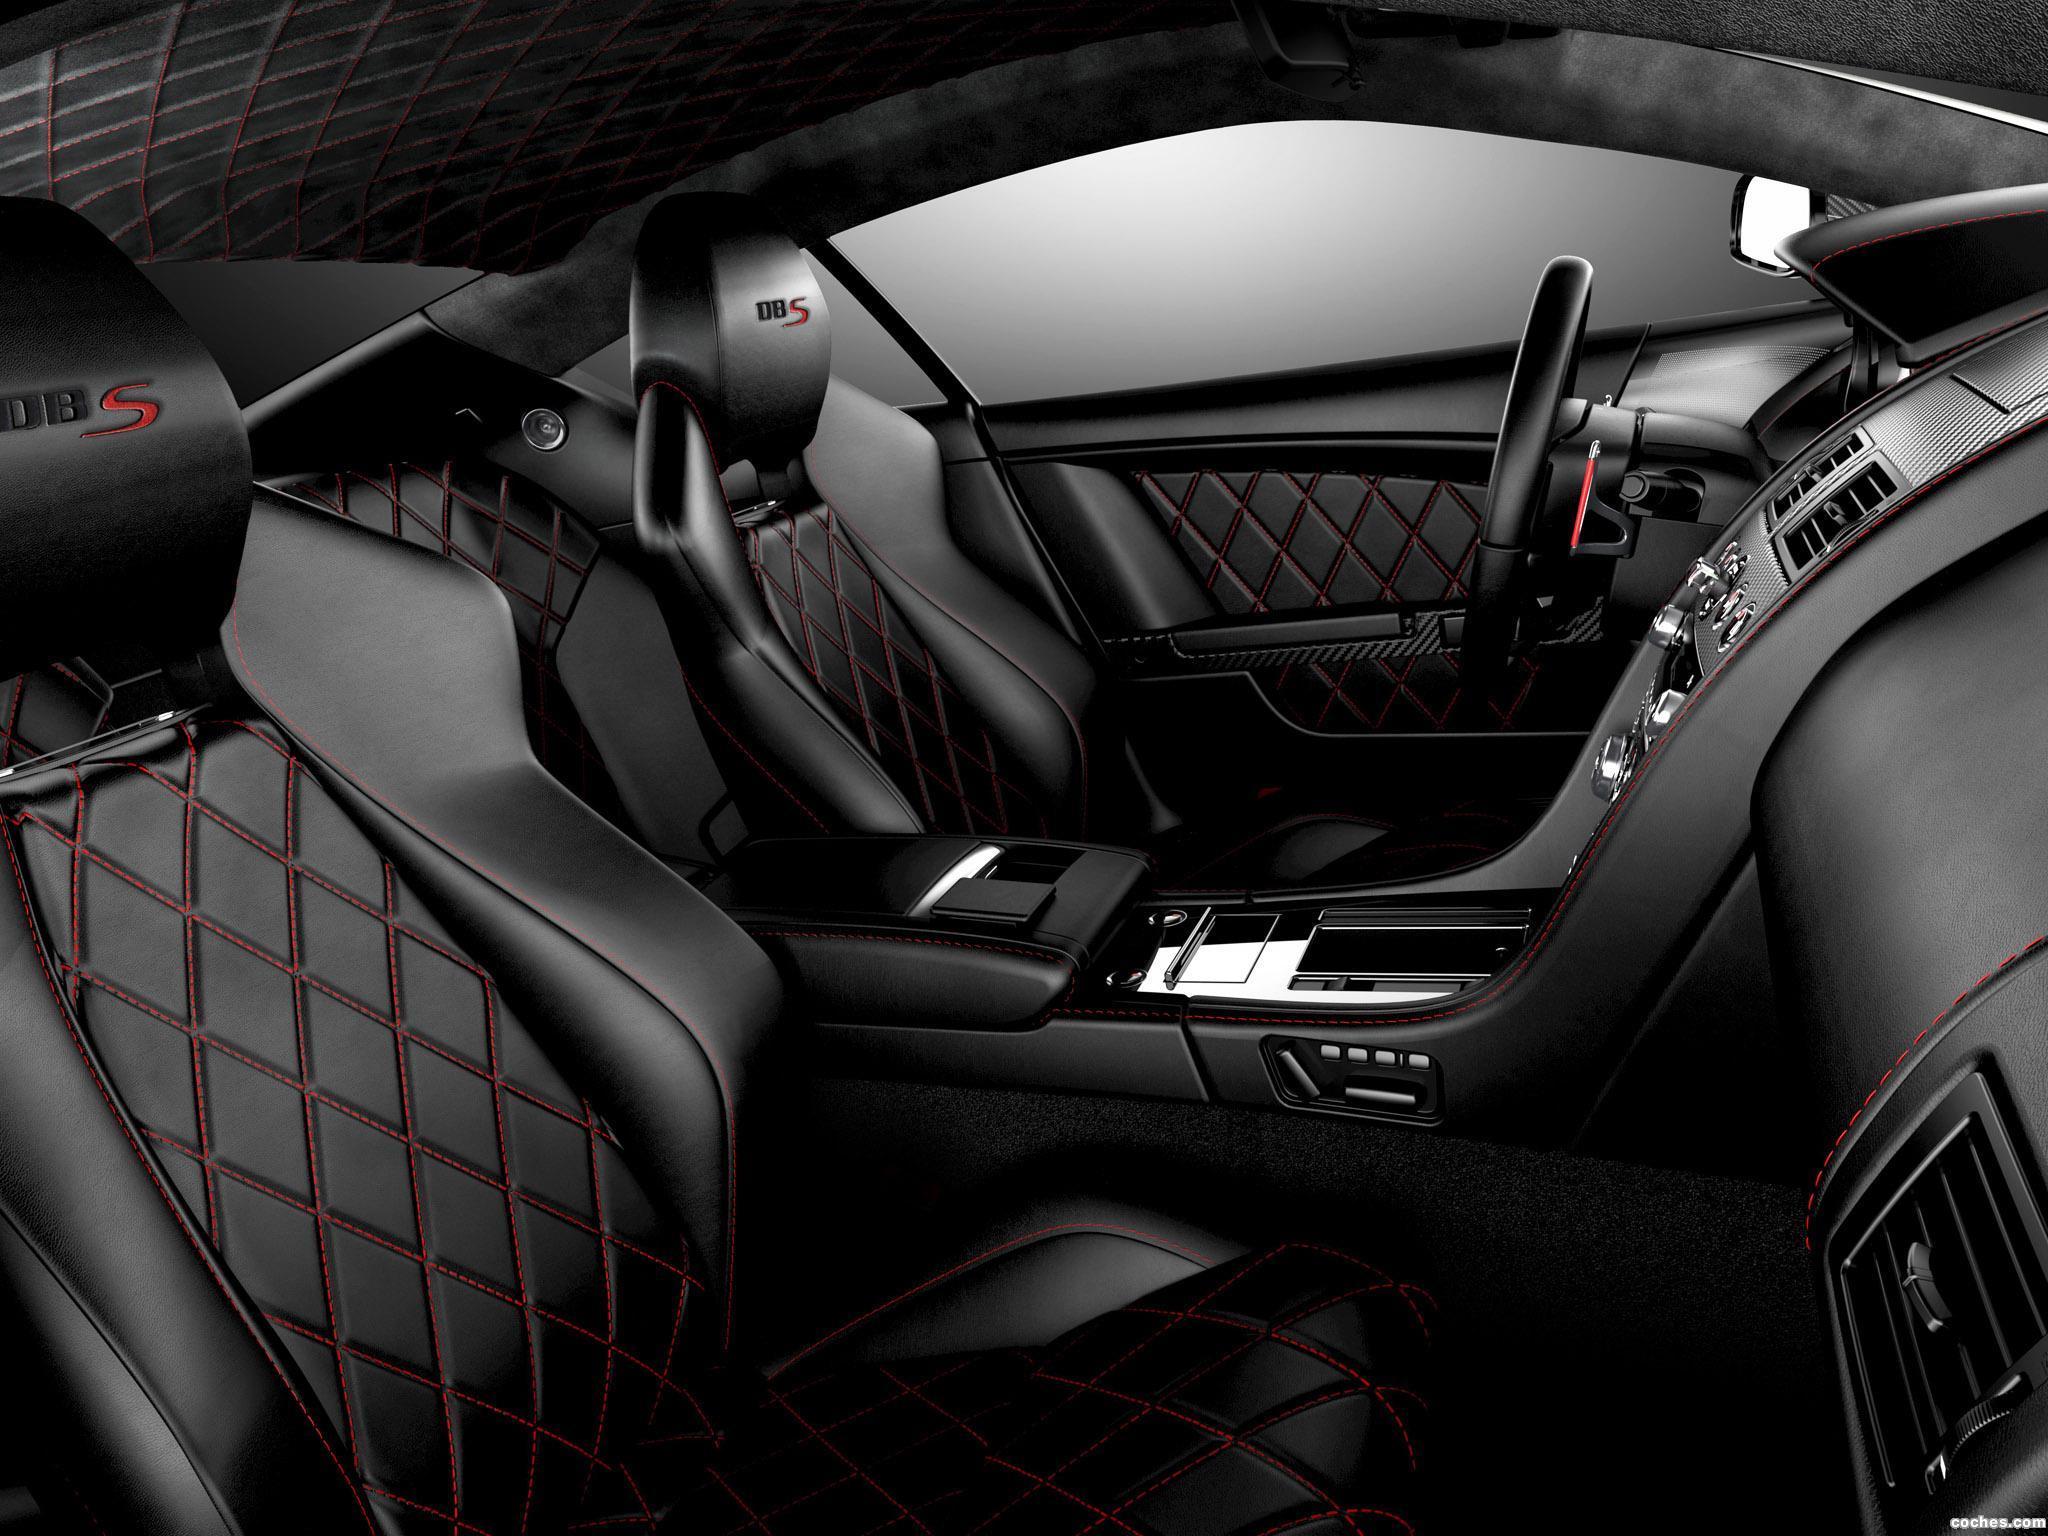 Foto 2 de Aston Martin DBS Ultimate 2012